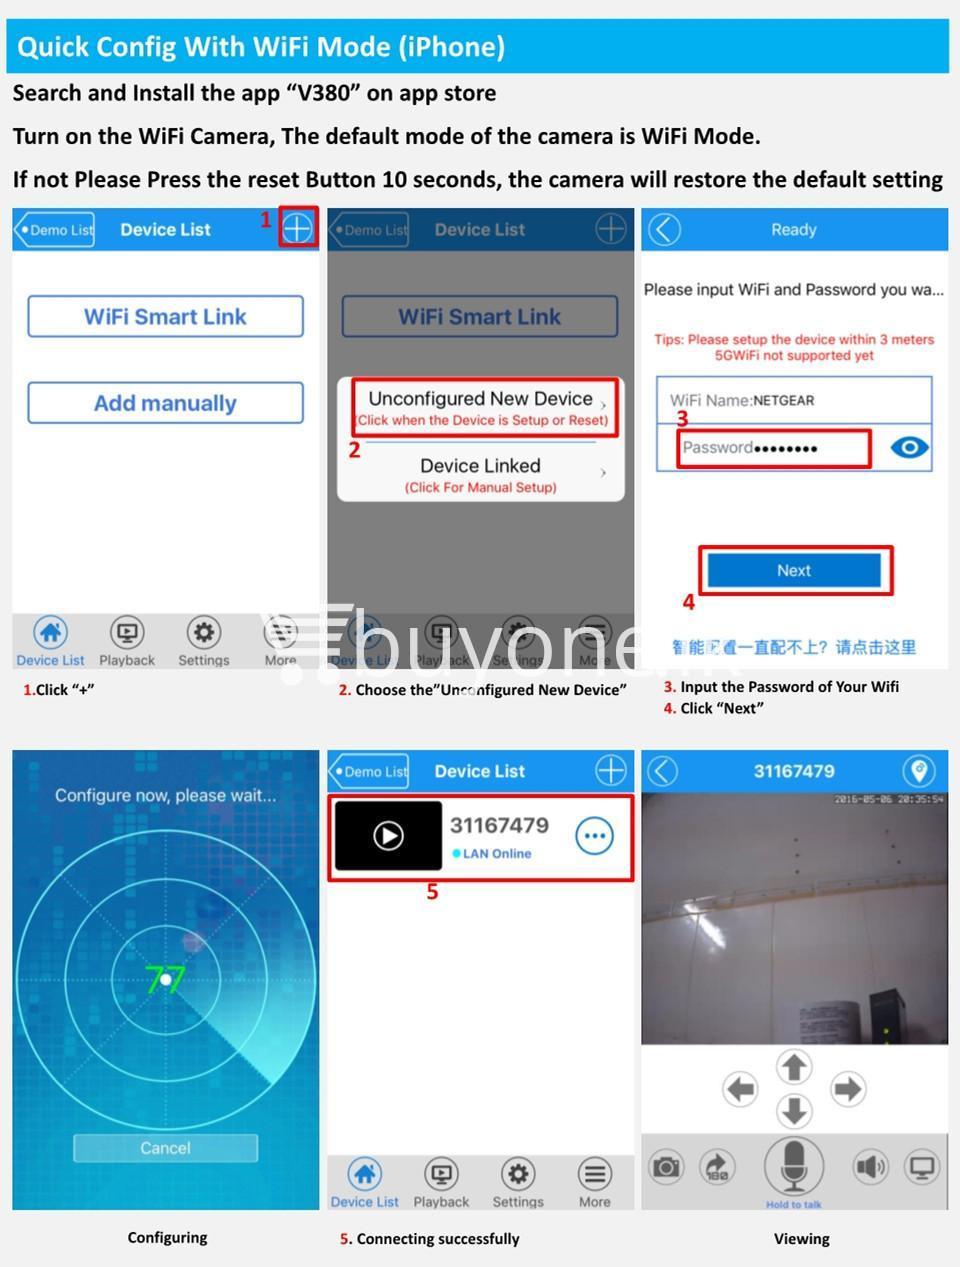 wifi smart net camera ip camera wireless with warranty camera store special best offer buy one lk sri lanka 12049 - Wifi Smart Net Camera IP Camera Wireless with Warranty